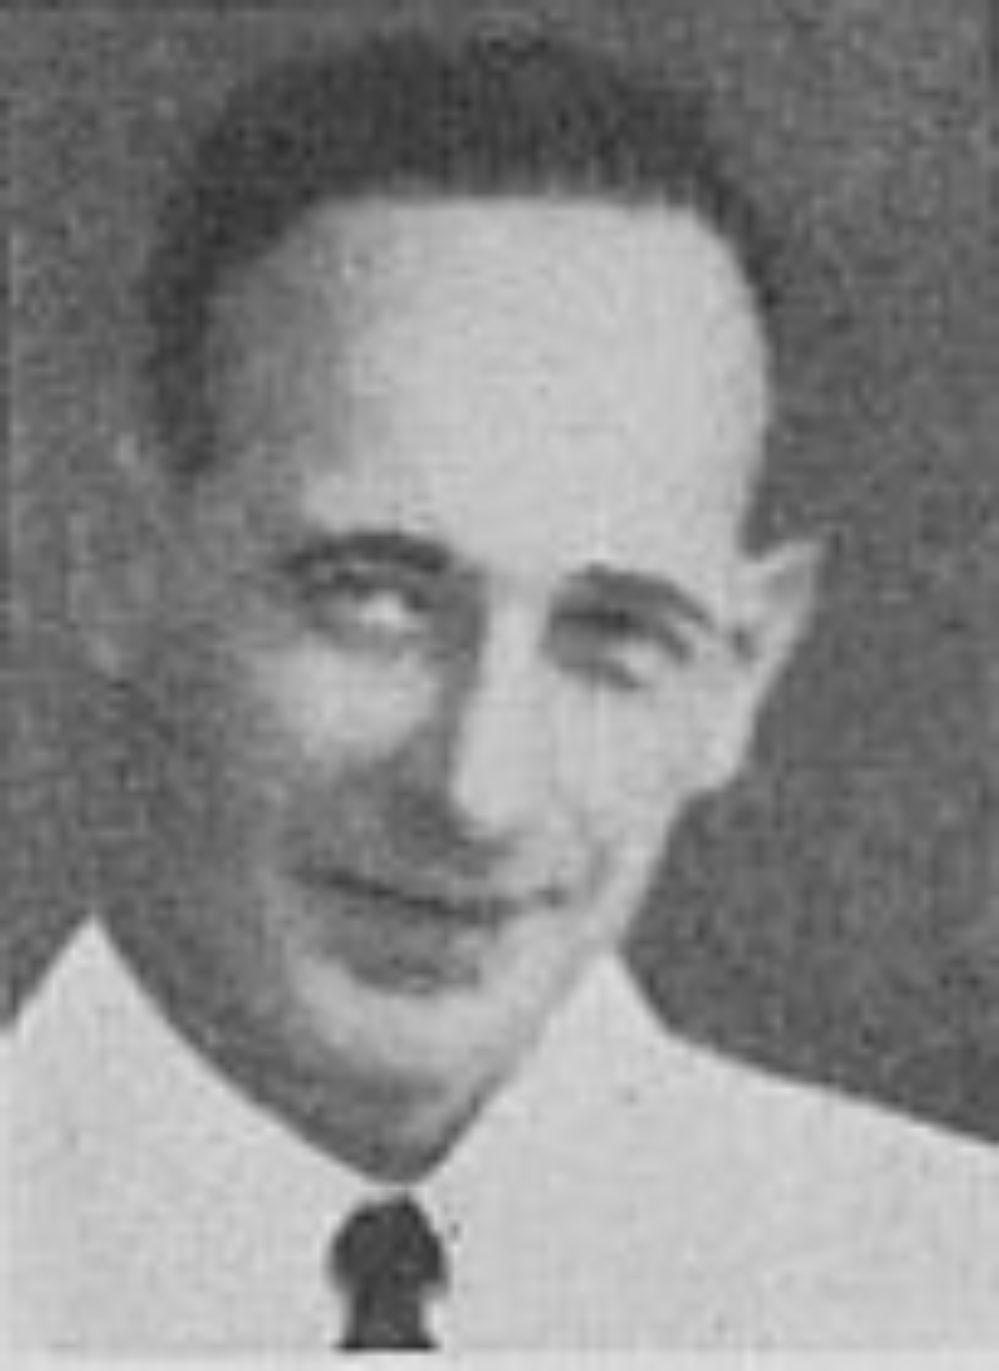 Bent Johan Flørenæs